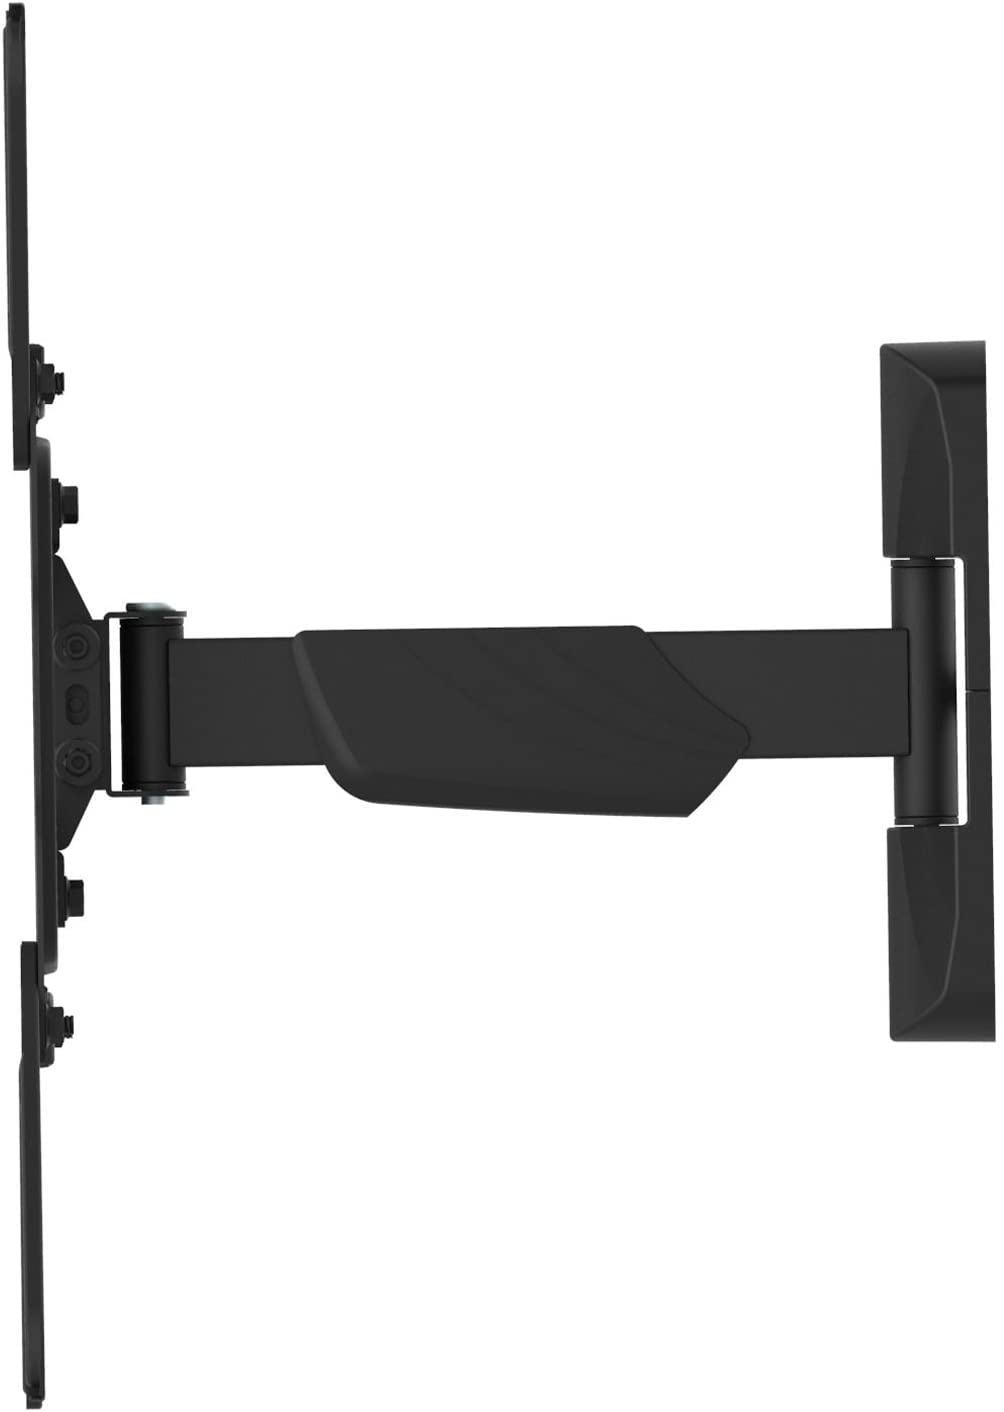 premium tv wandhalterung f r plasma lcd led tft monitor fernseher 13 55 zoll neigbar. Black Bedroom Furniture Sets. Home Design Ideas